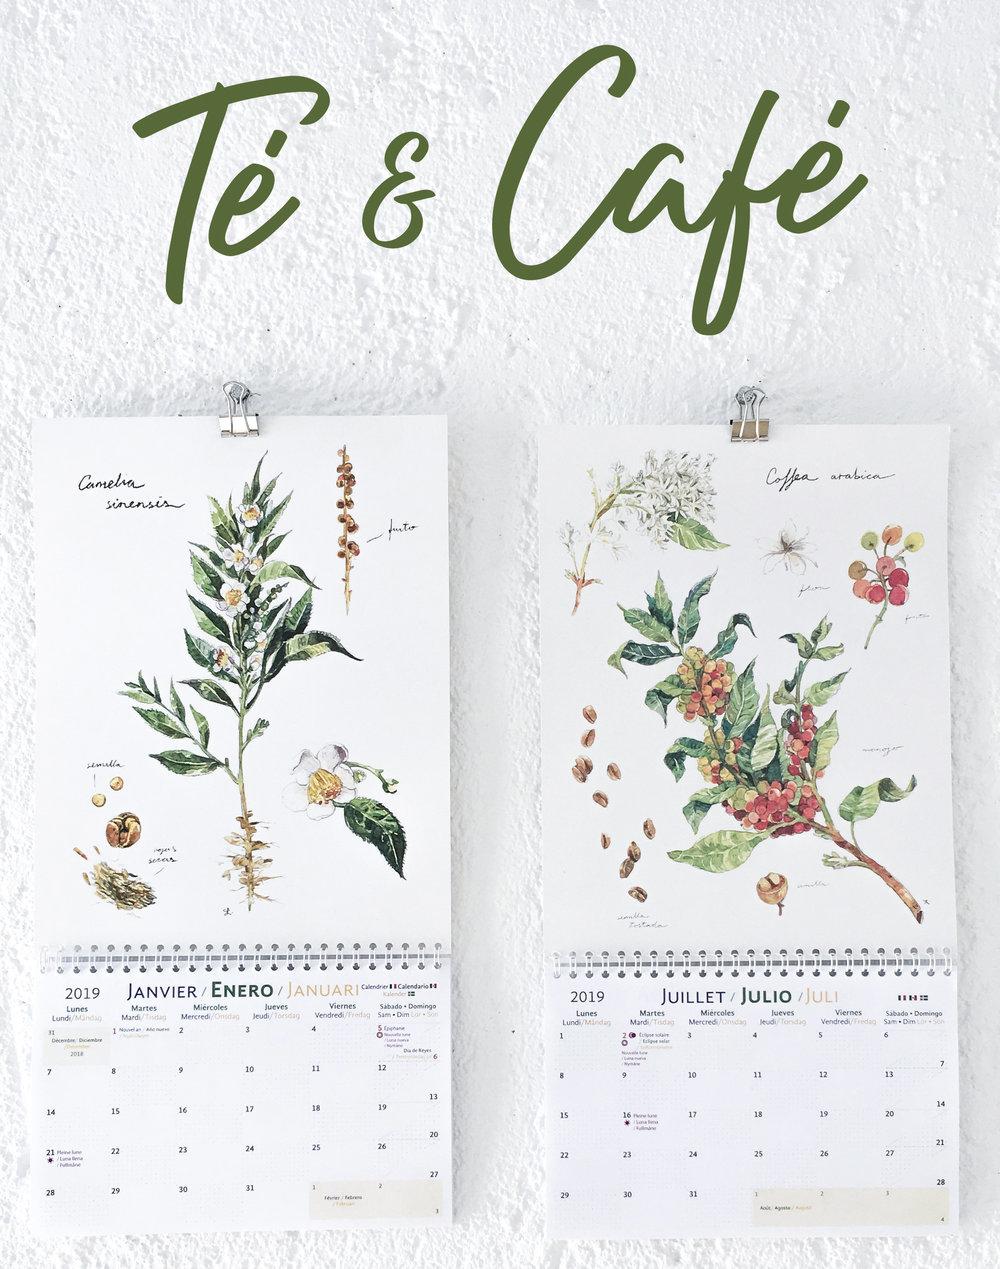 Tea & Coffee illustration • Illustration de Thé & Café